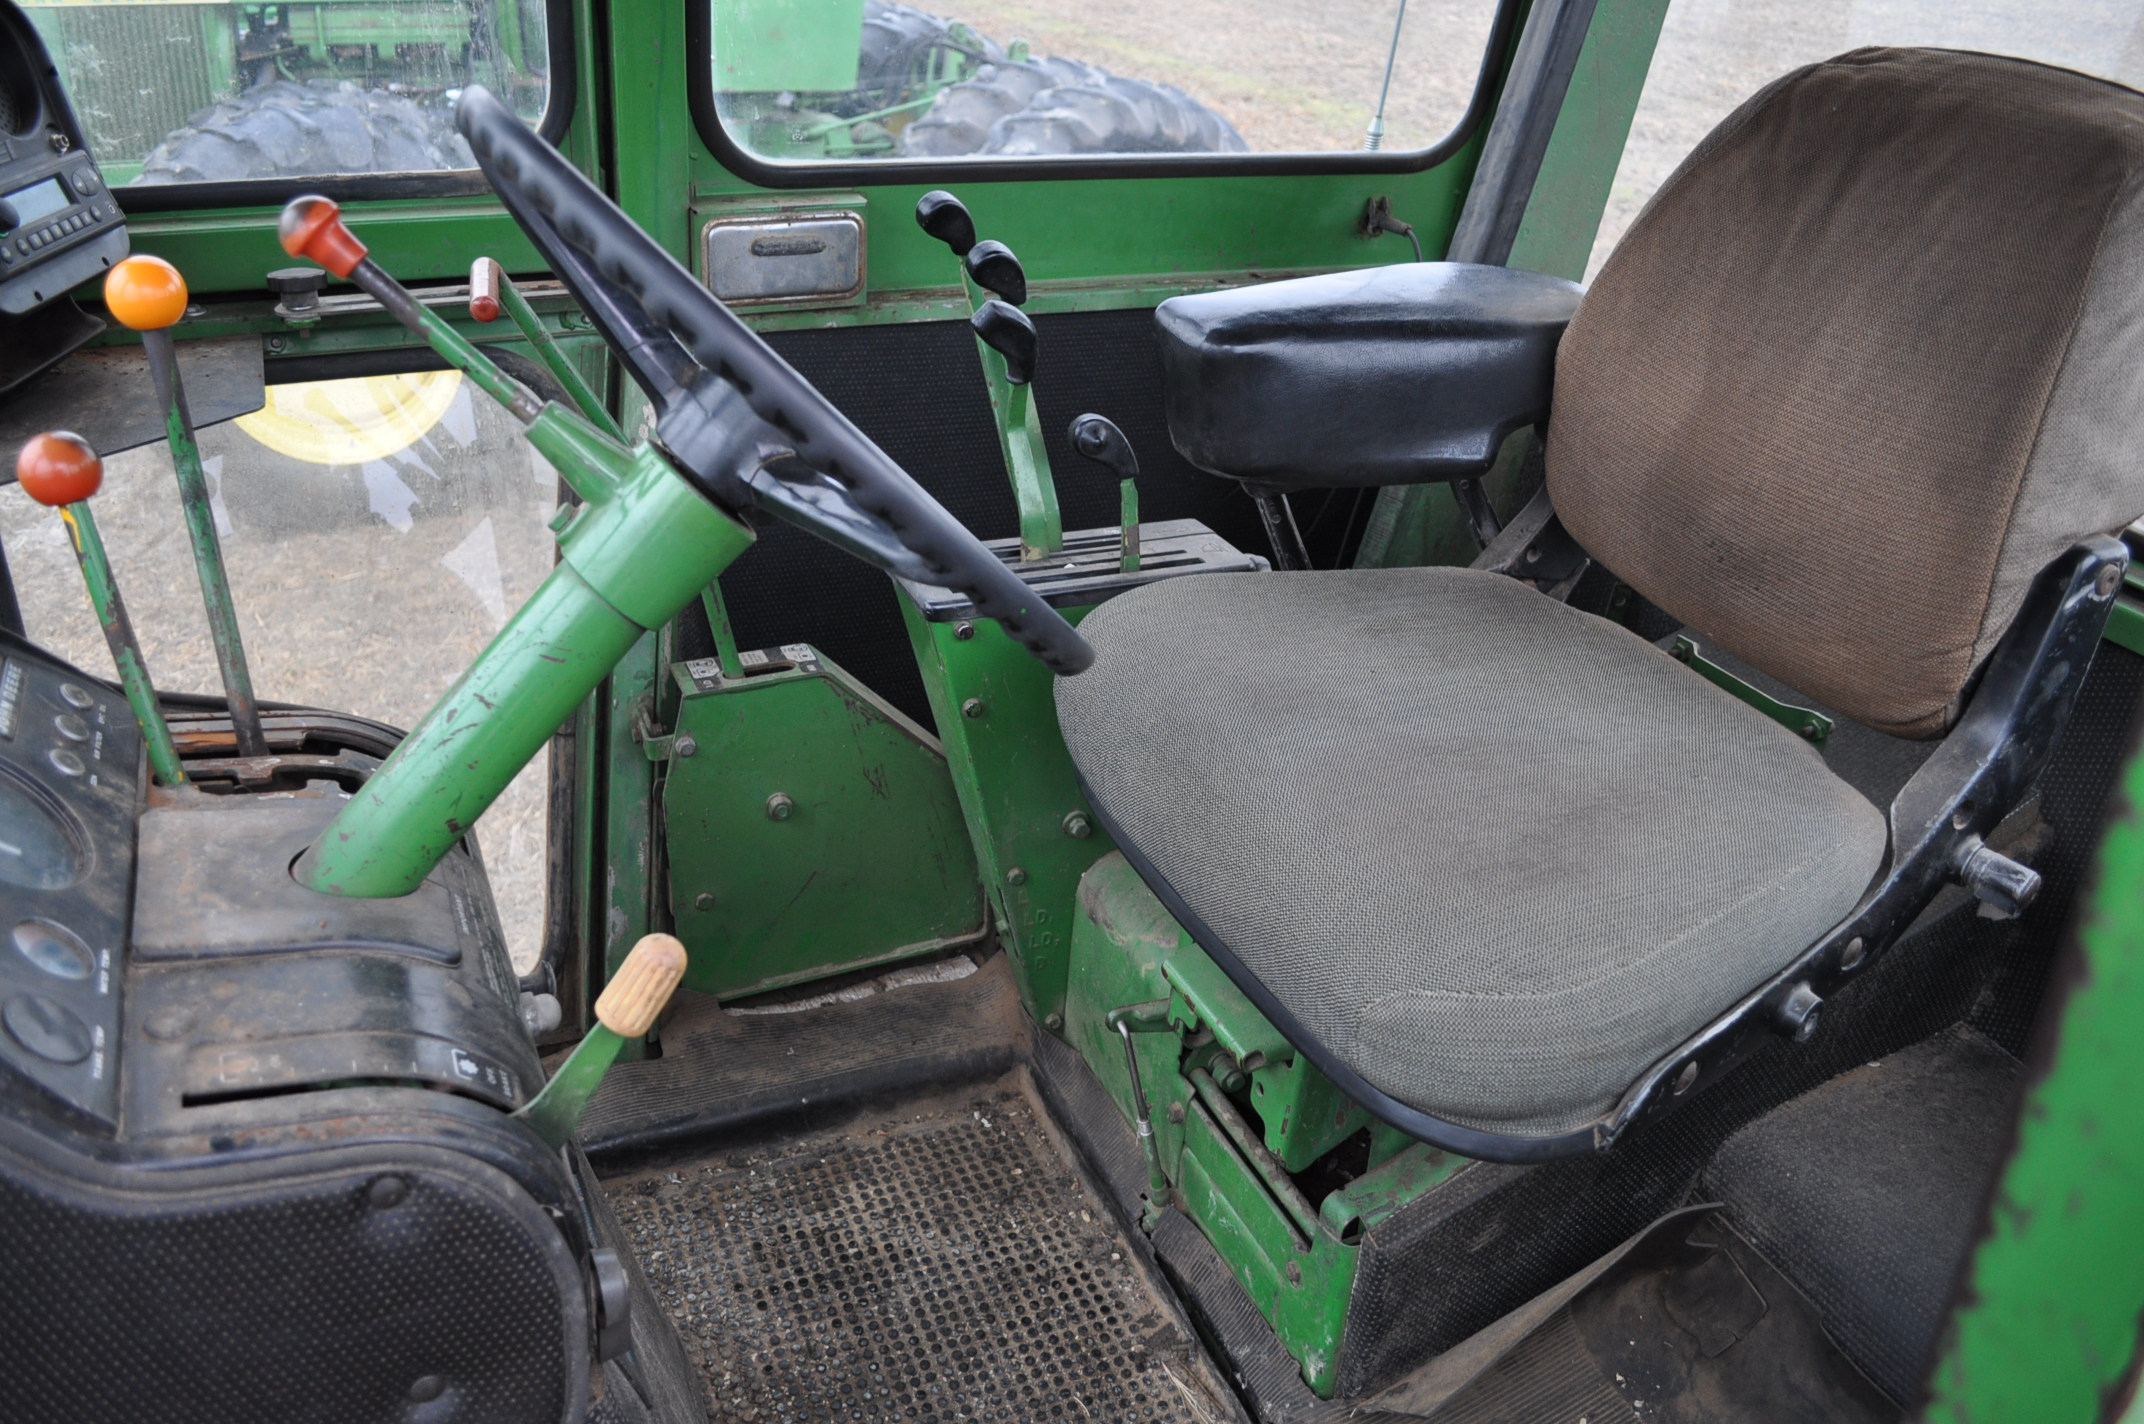 John Deere 7520 tractor, 4WD, diesel, 18.4-34 duals, original fenders, CHA, cab interior kit, 3 - Image 14 of 24